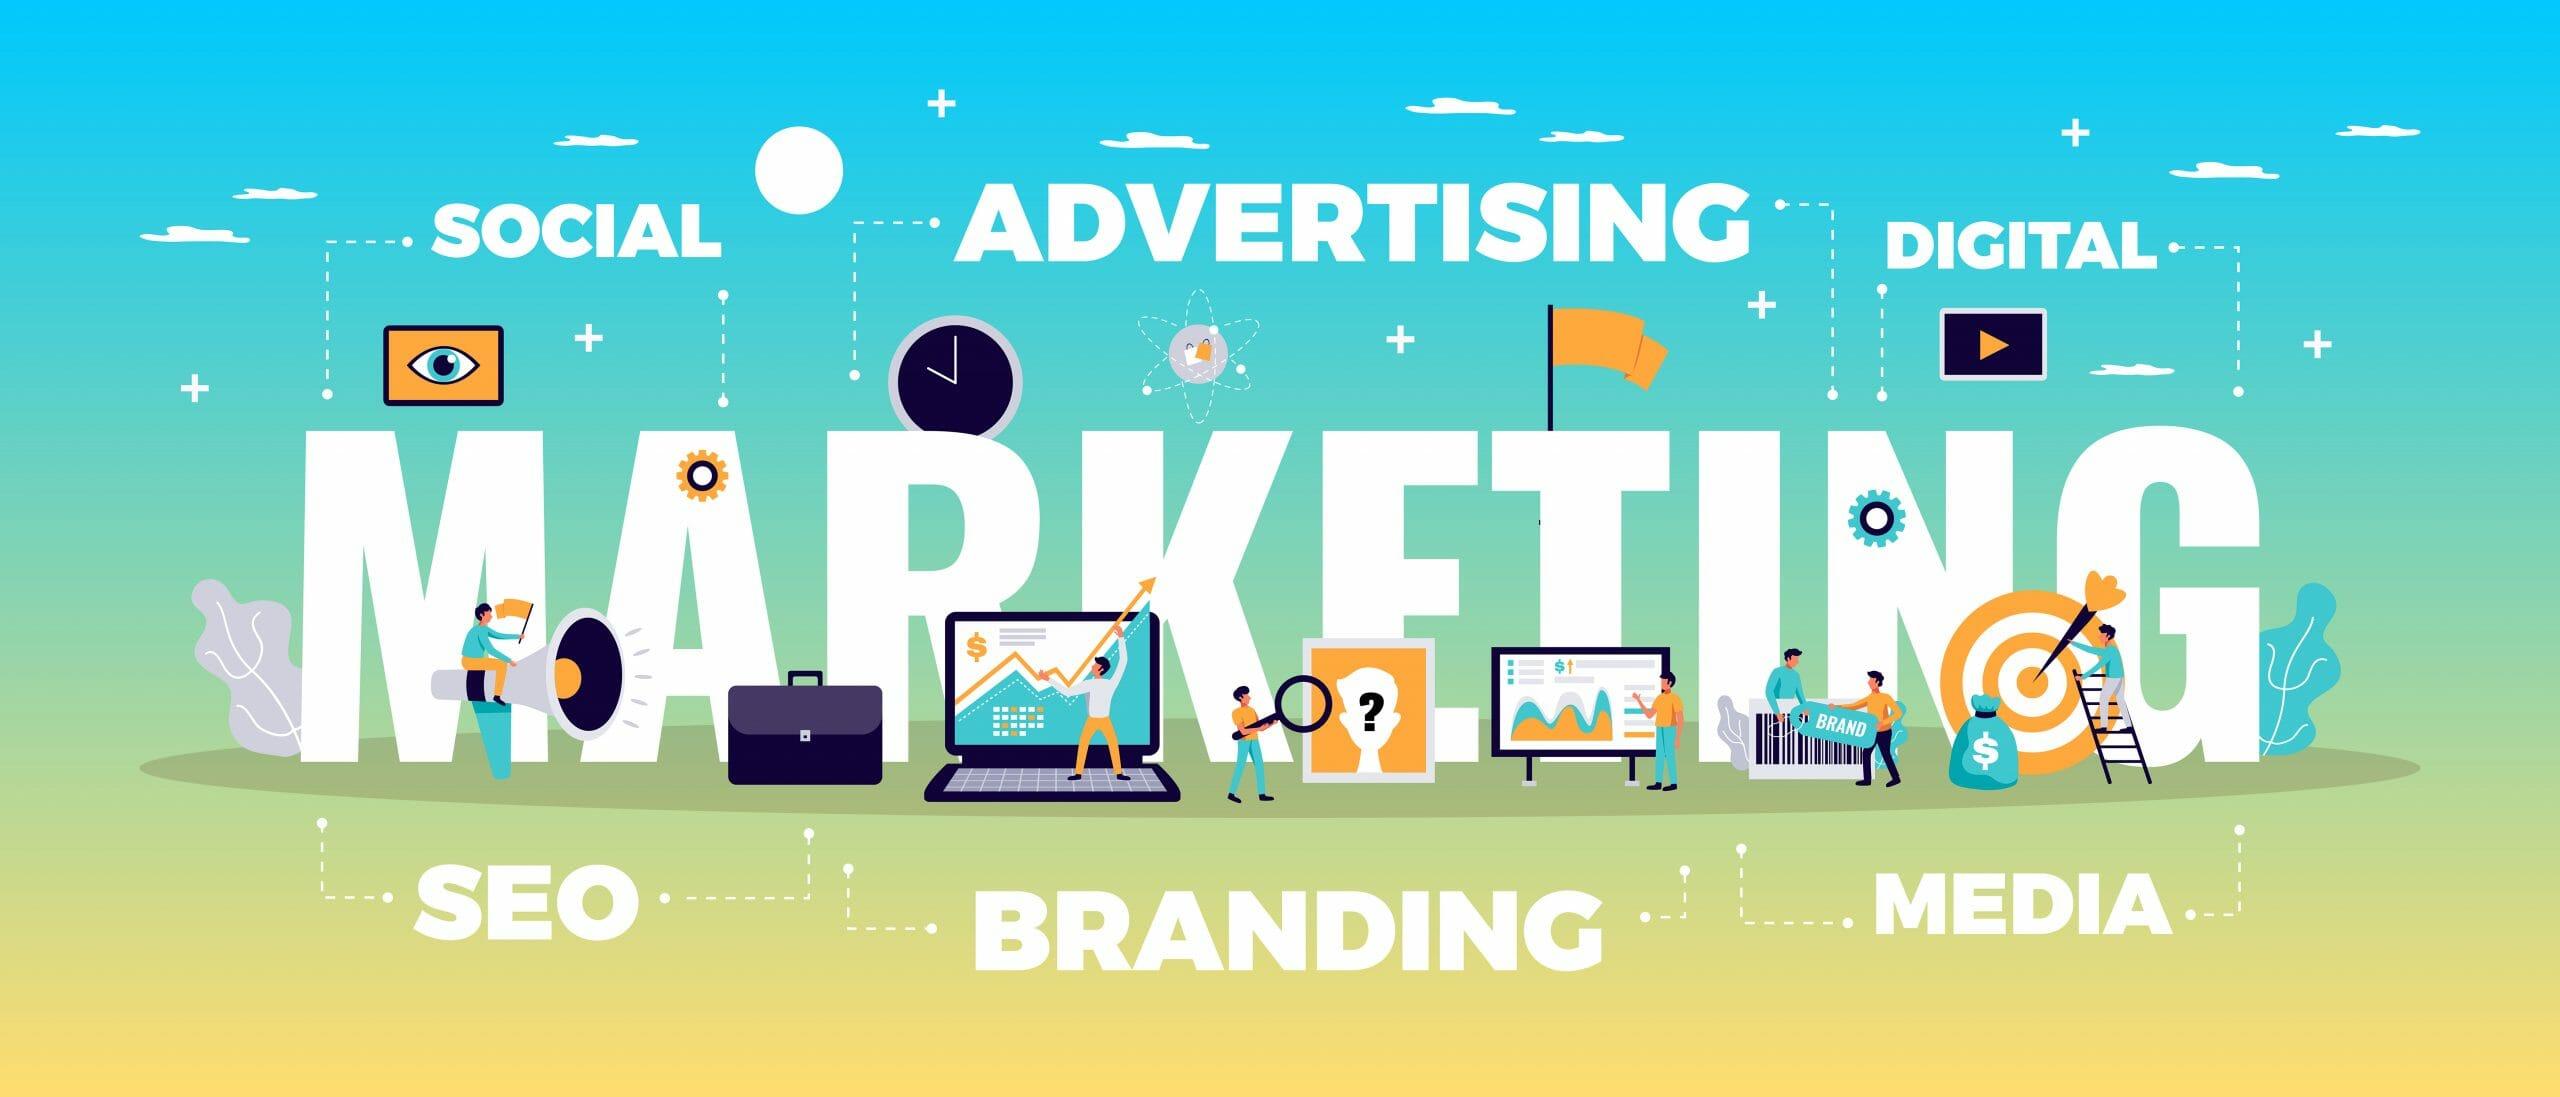 Freeland Park internet marketing service